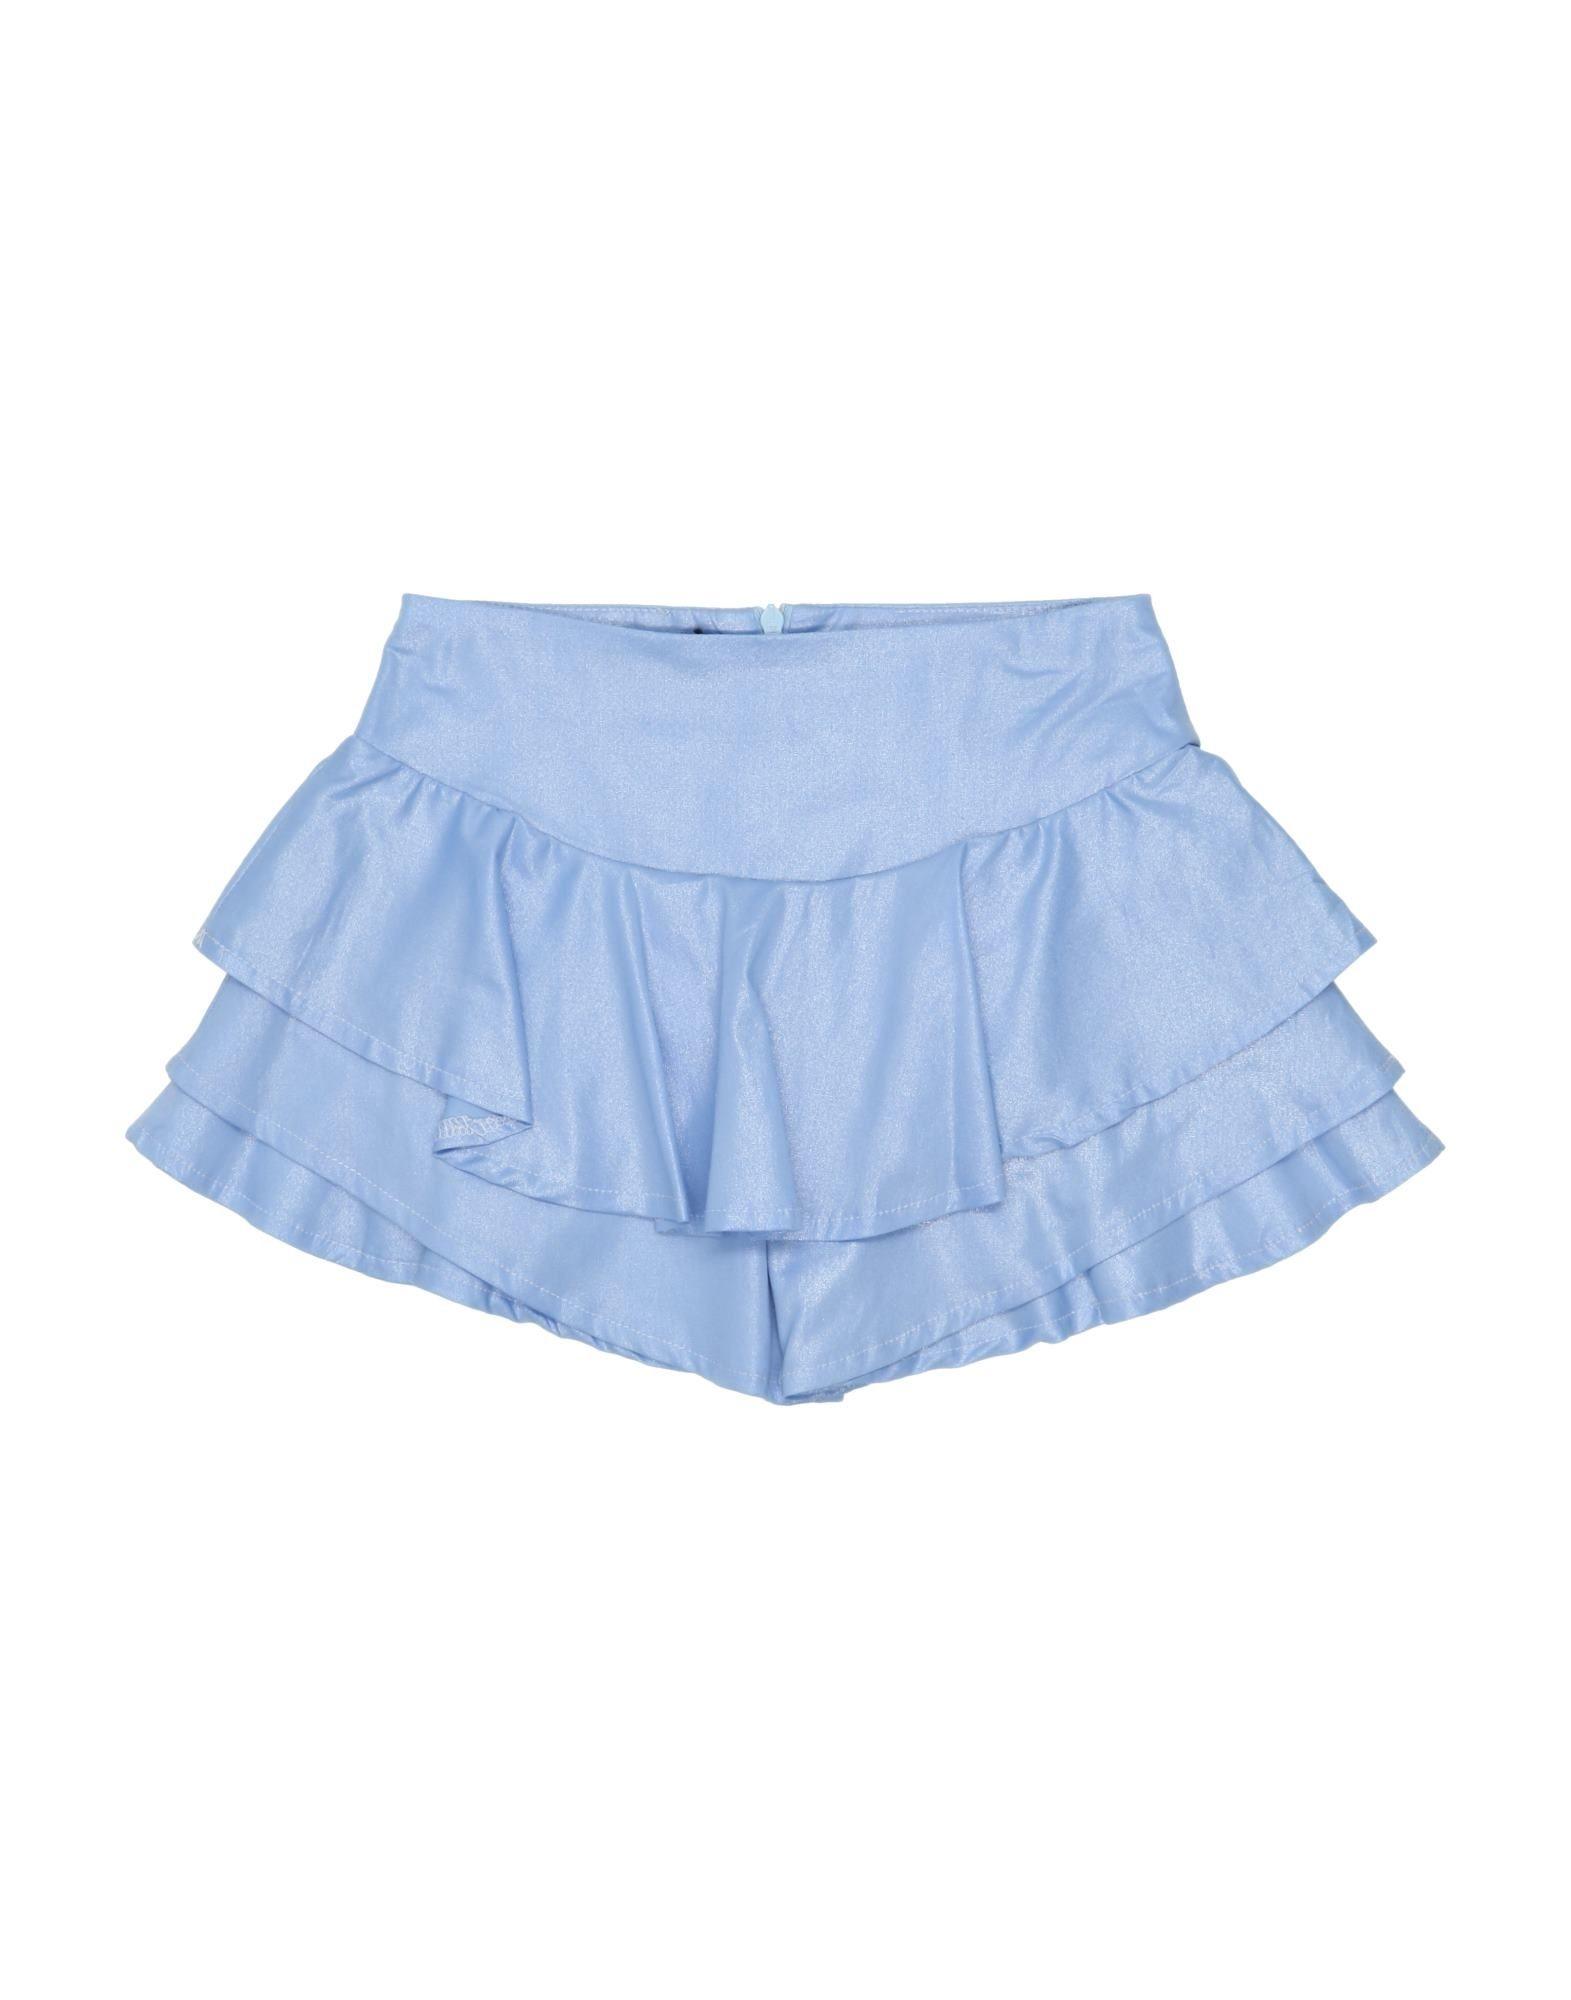 Miss Lulù Kids' Skirts In Sky Blue